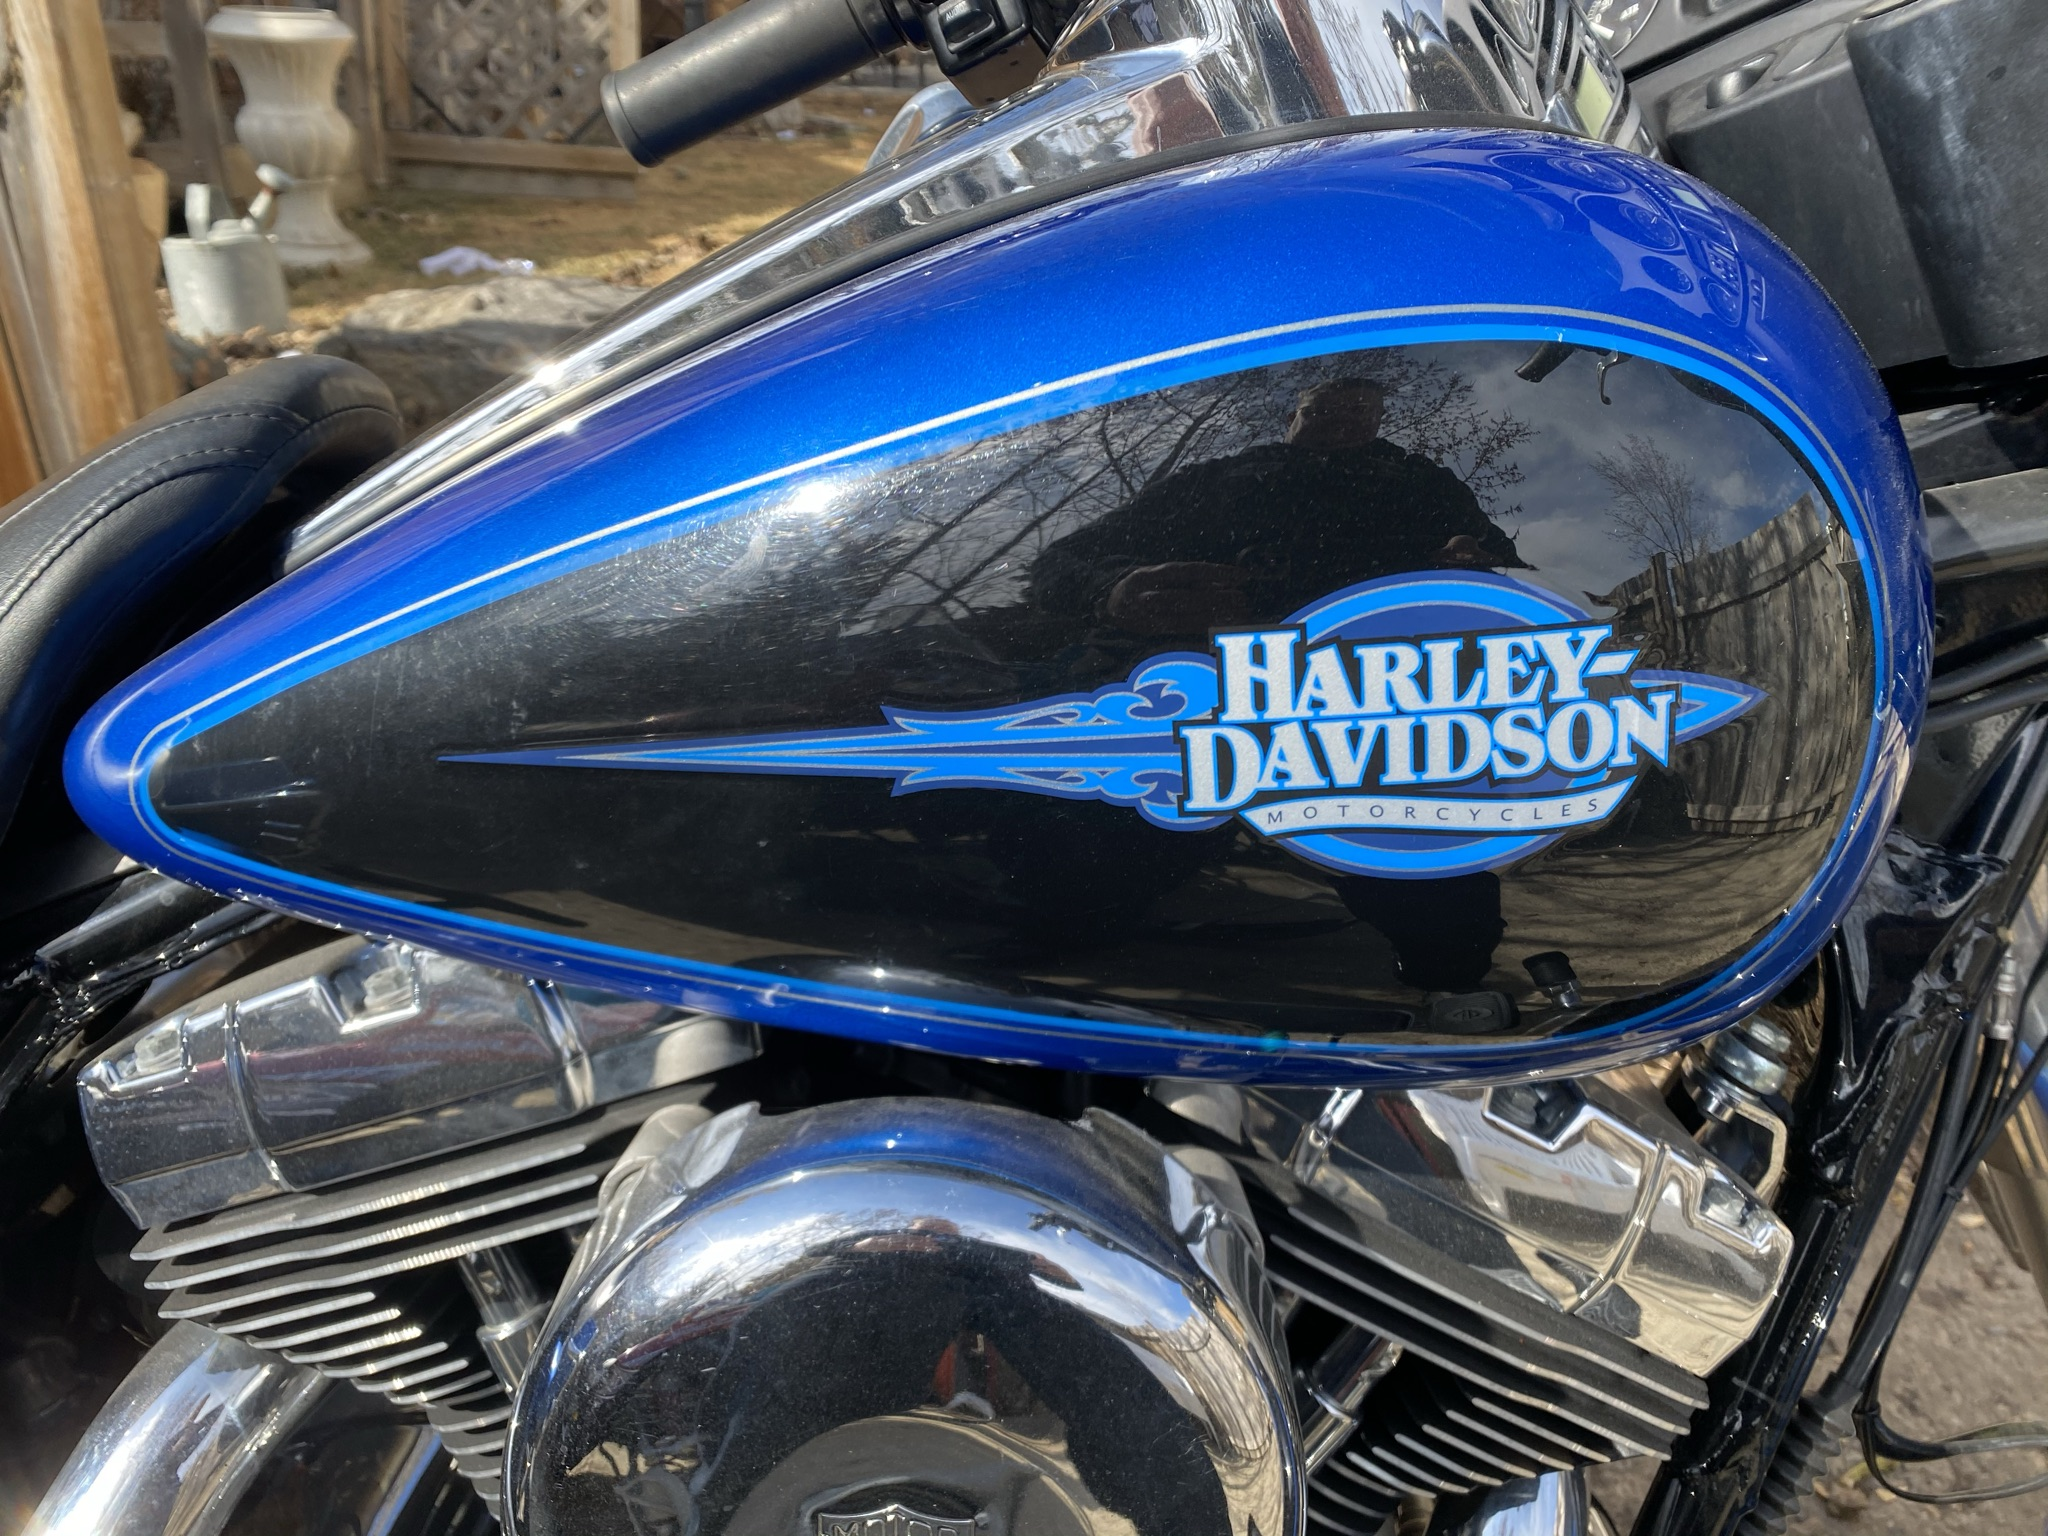 Harley Davidson Motorcycles Edmonton Auction